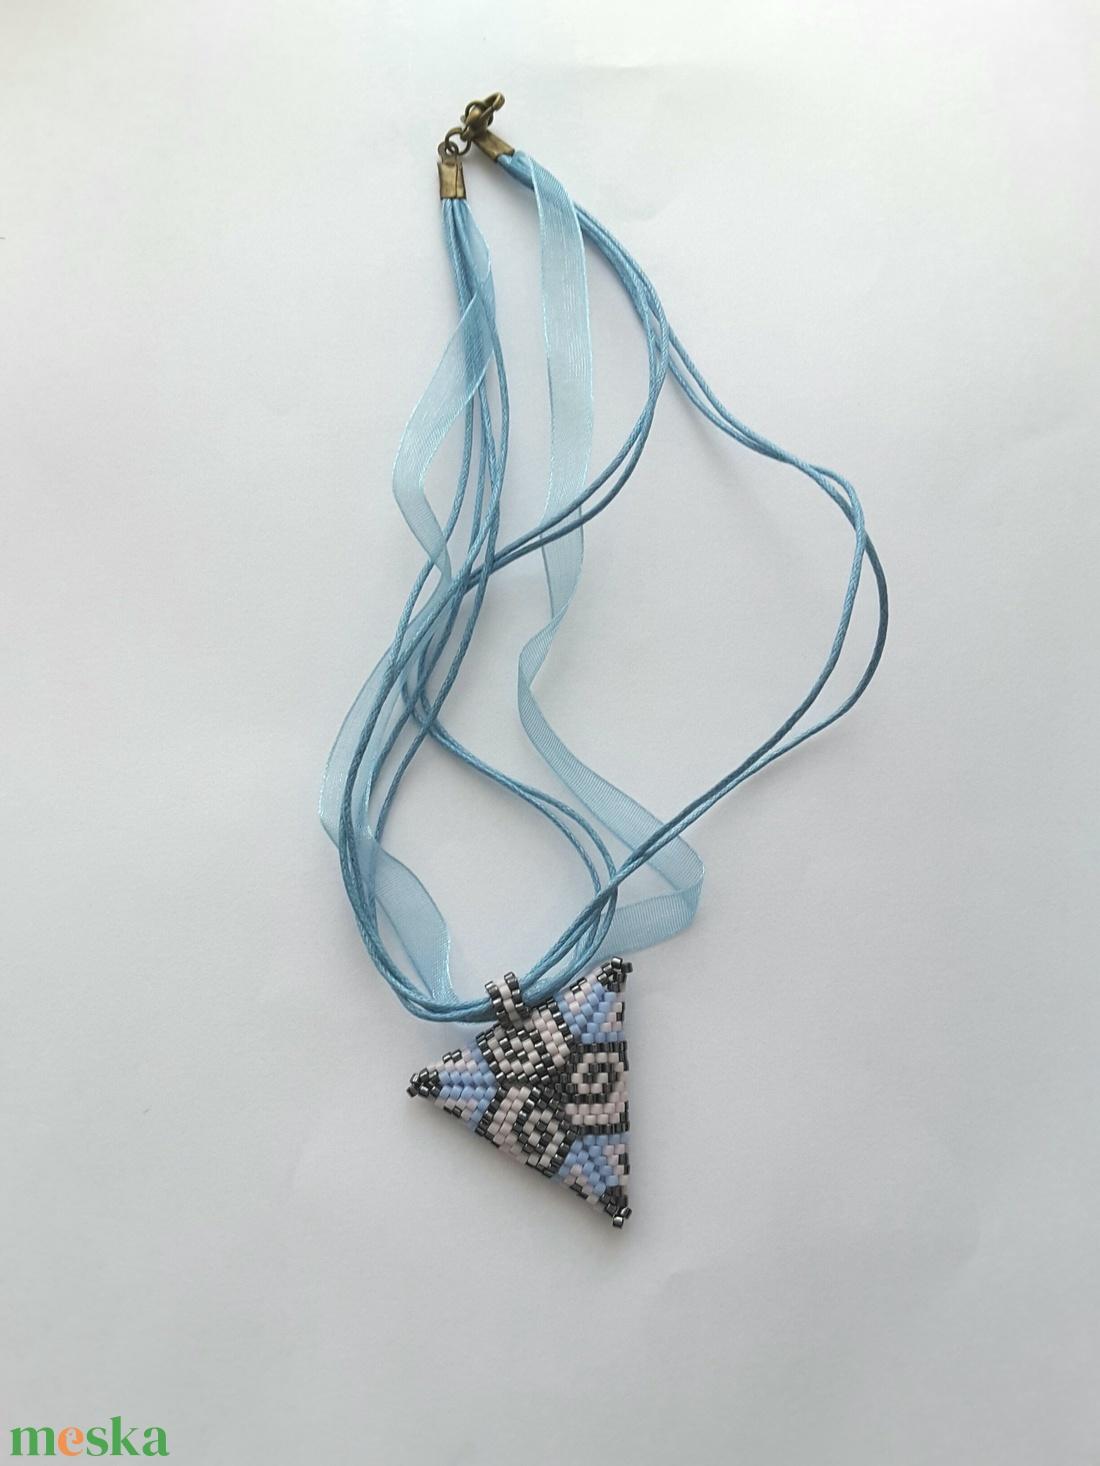 Háromszög nyaklánc - Meska.hu